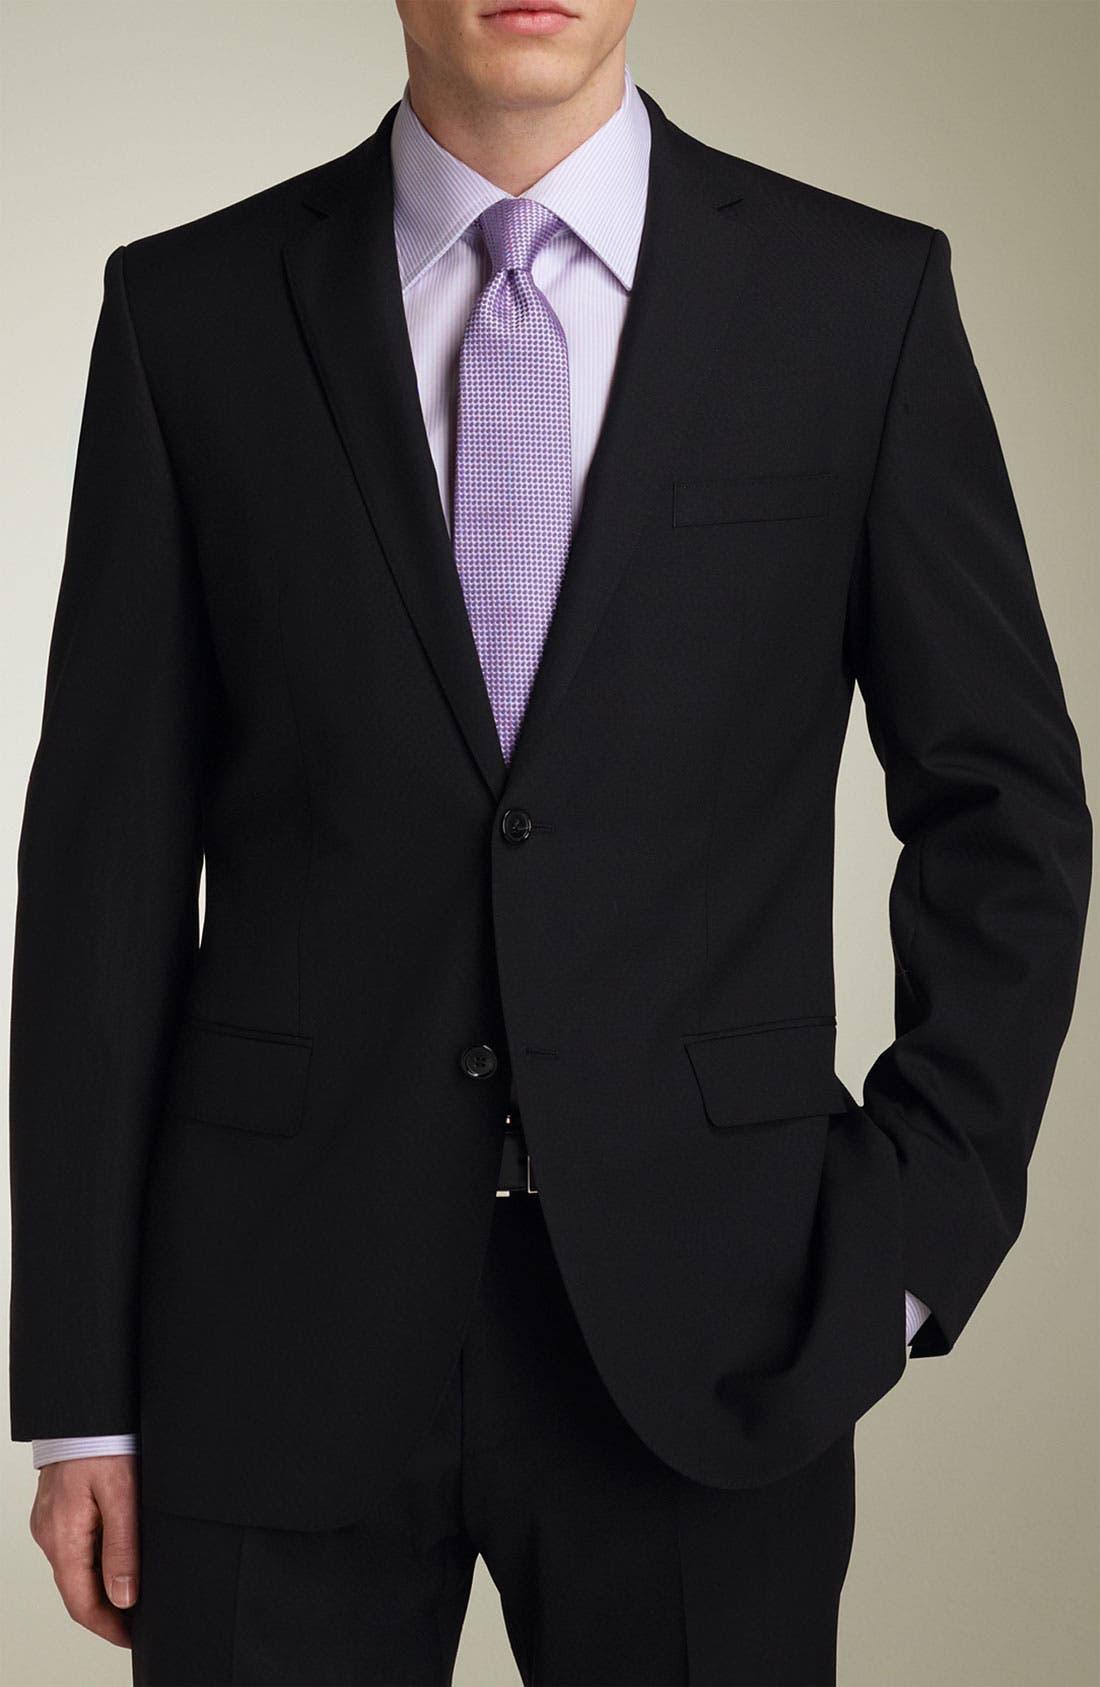 Main Image - BOSS 'Jam/Sharp' Trim Fit Black Virgin Wool Suit